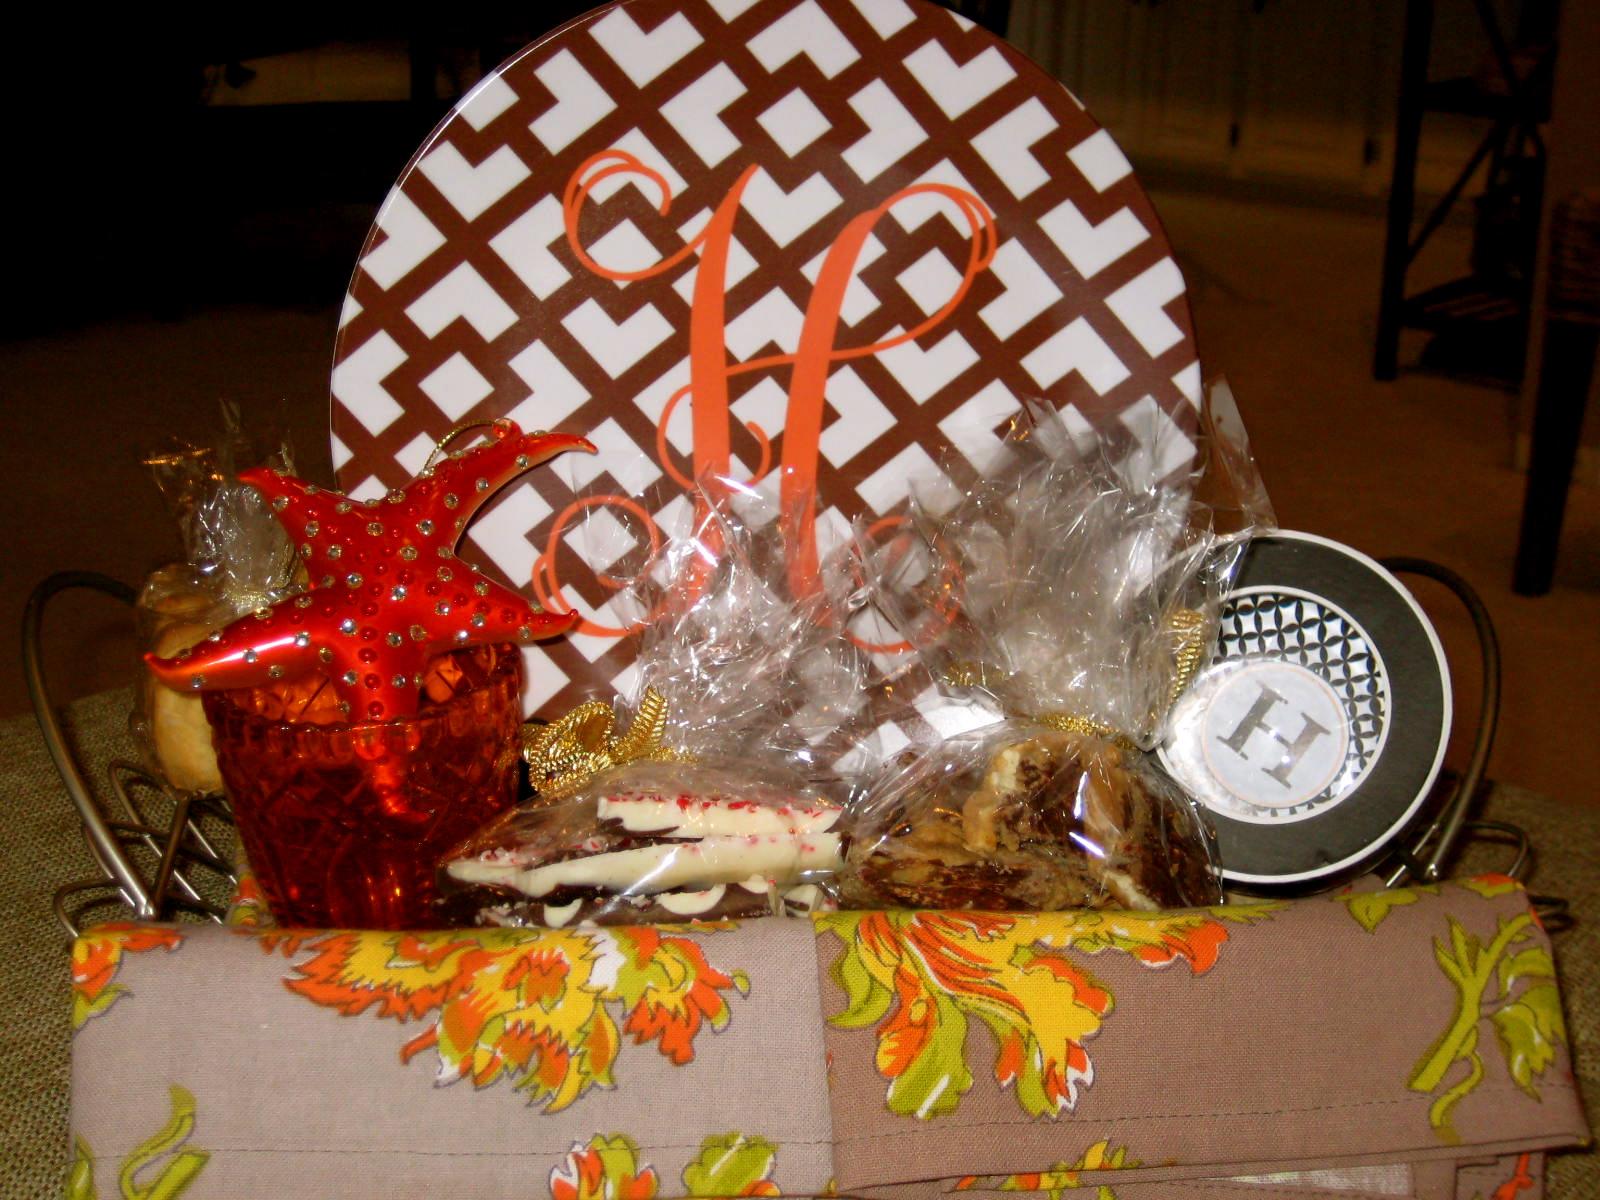 sadie   stella  how to  gift baskets